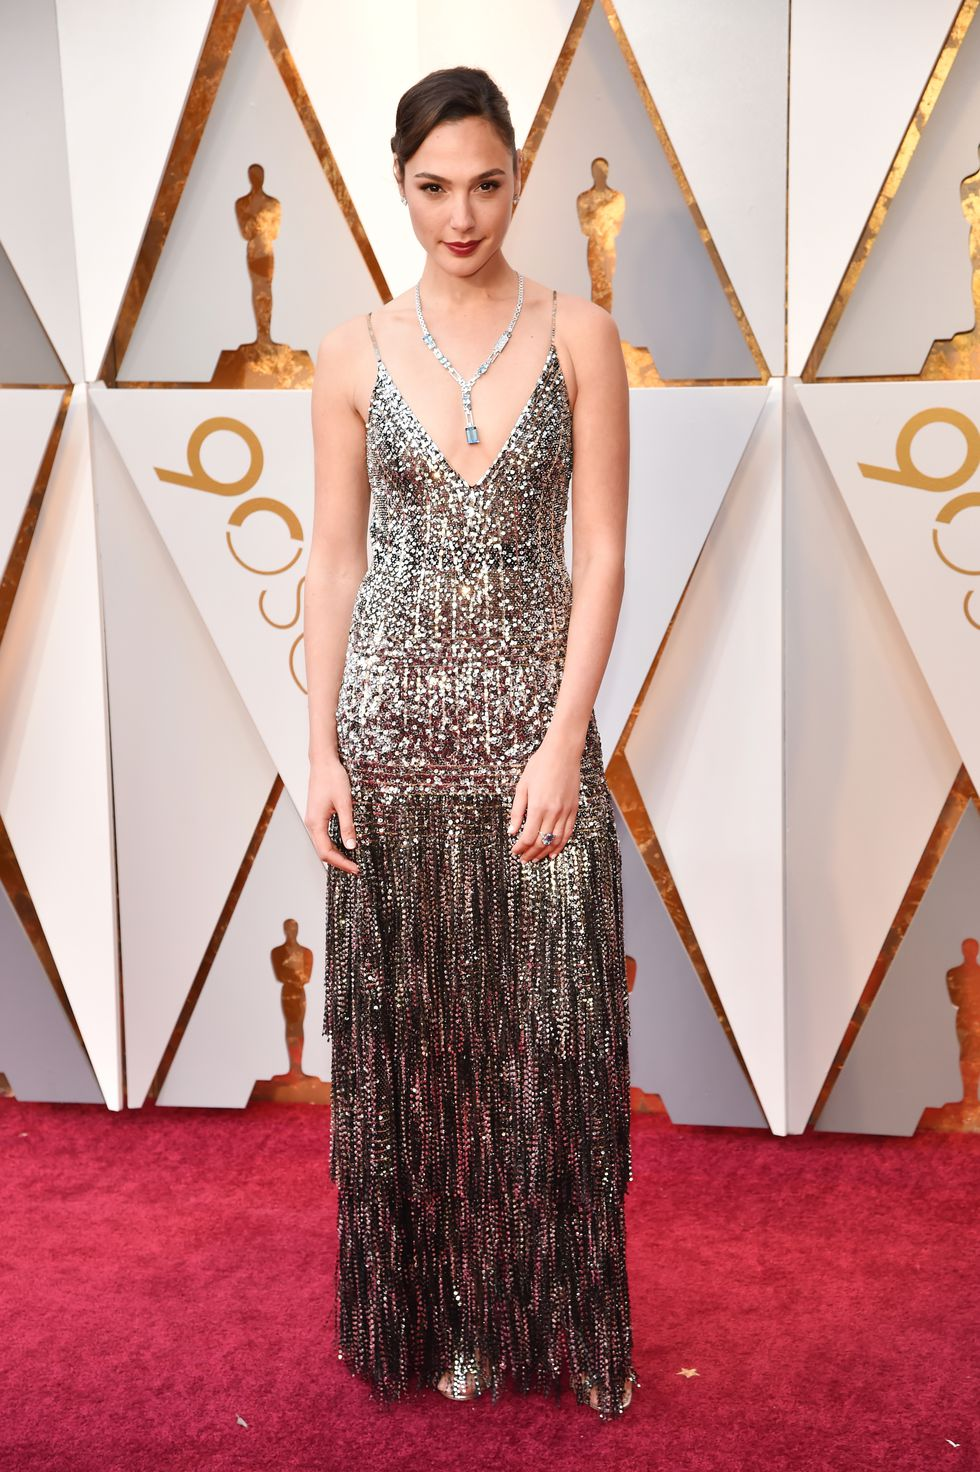 Gal Gadot Hingga Zendaya, Simak Penampilan Karpet Merah Terbaik di Oscars 2018